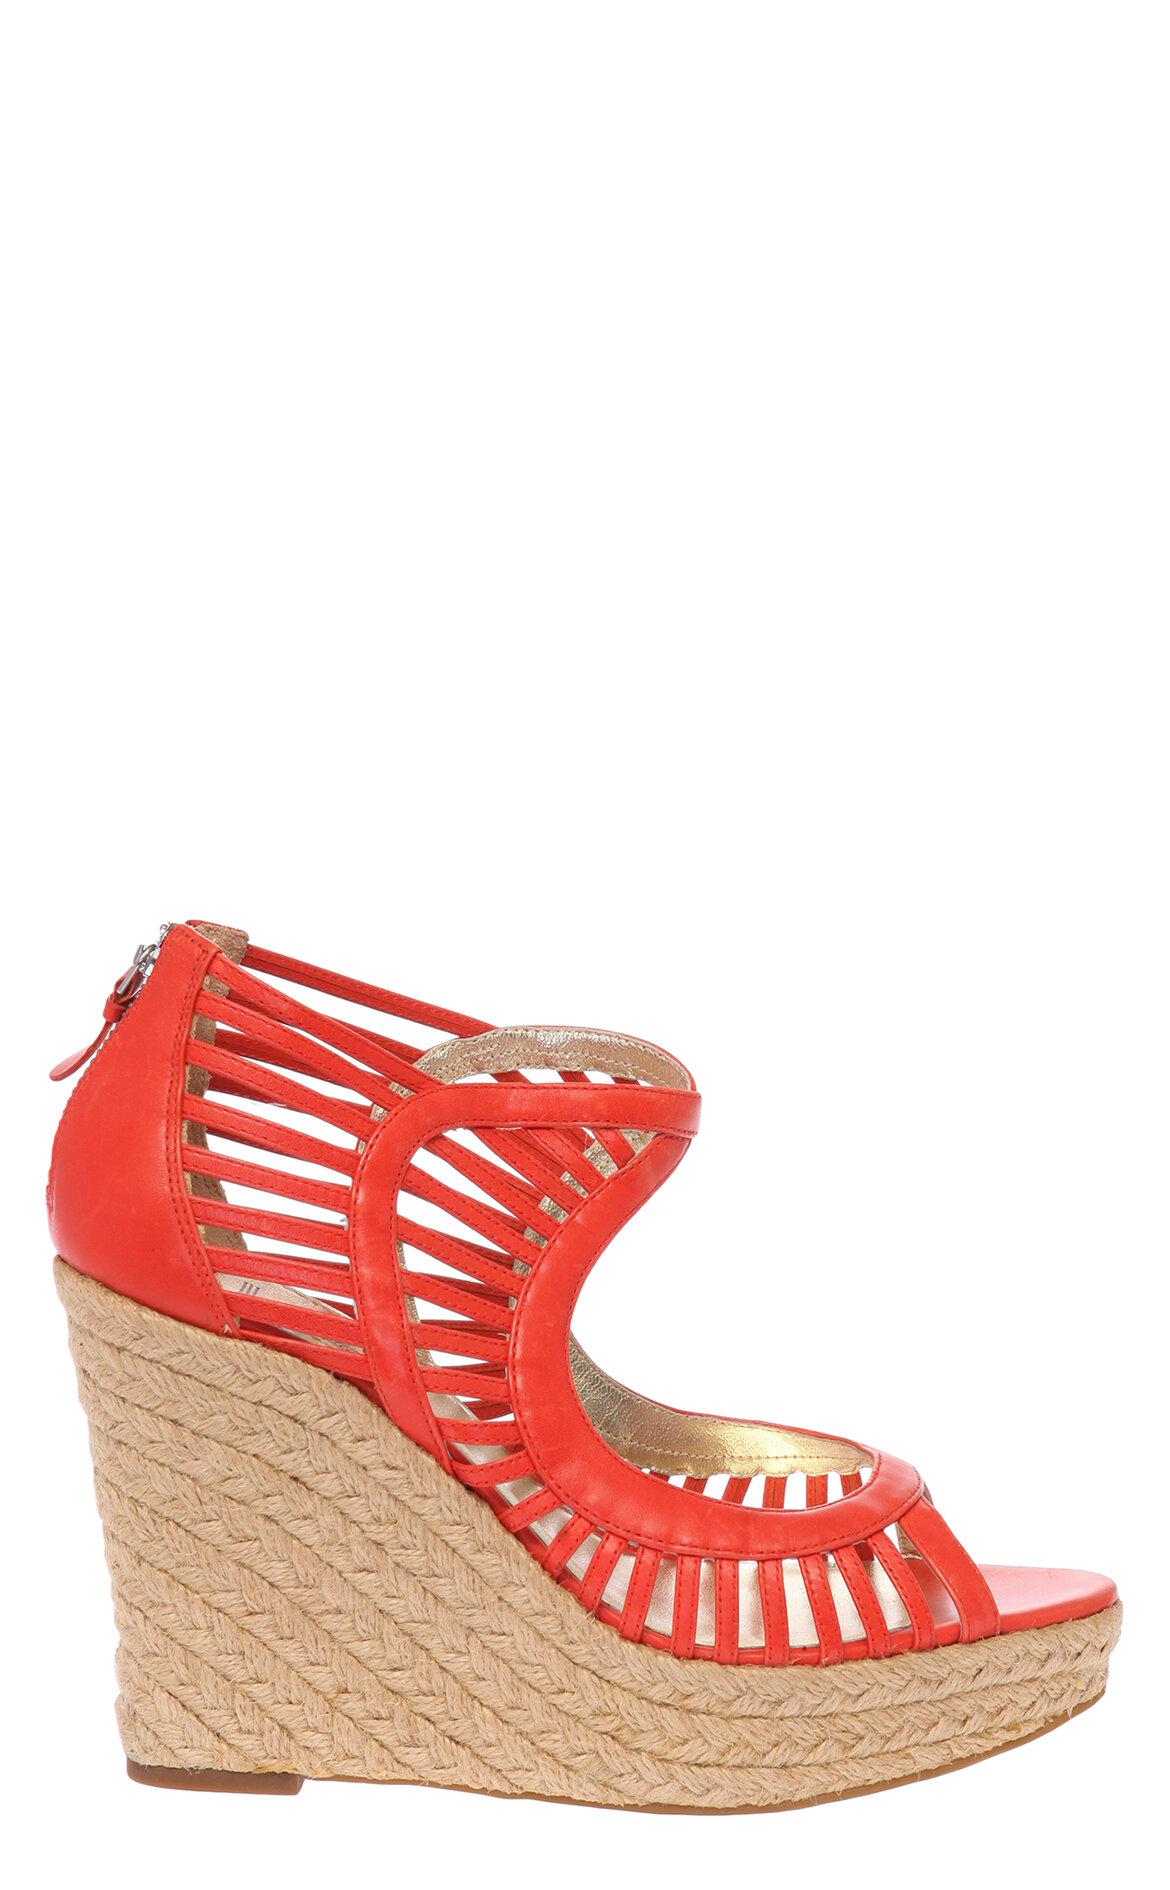 Sigerson Morrison Belle Ayakkabı